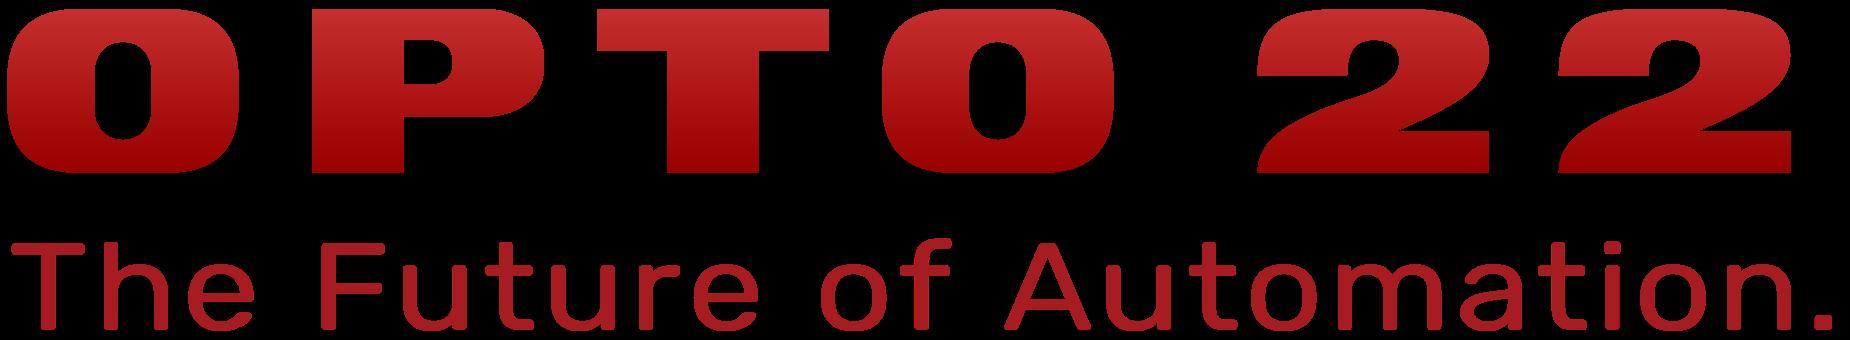 Opto 22 The Future Of Automation logo